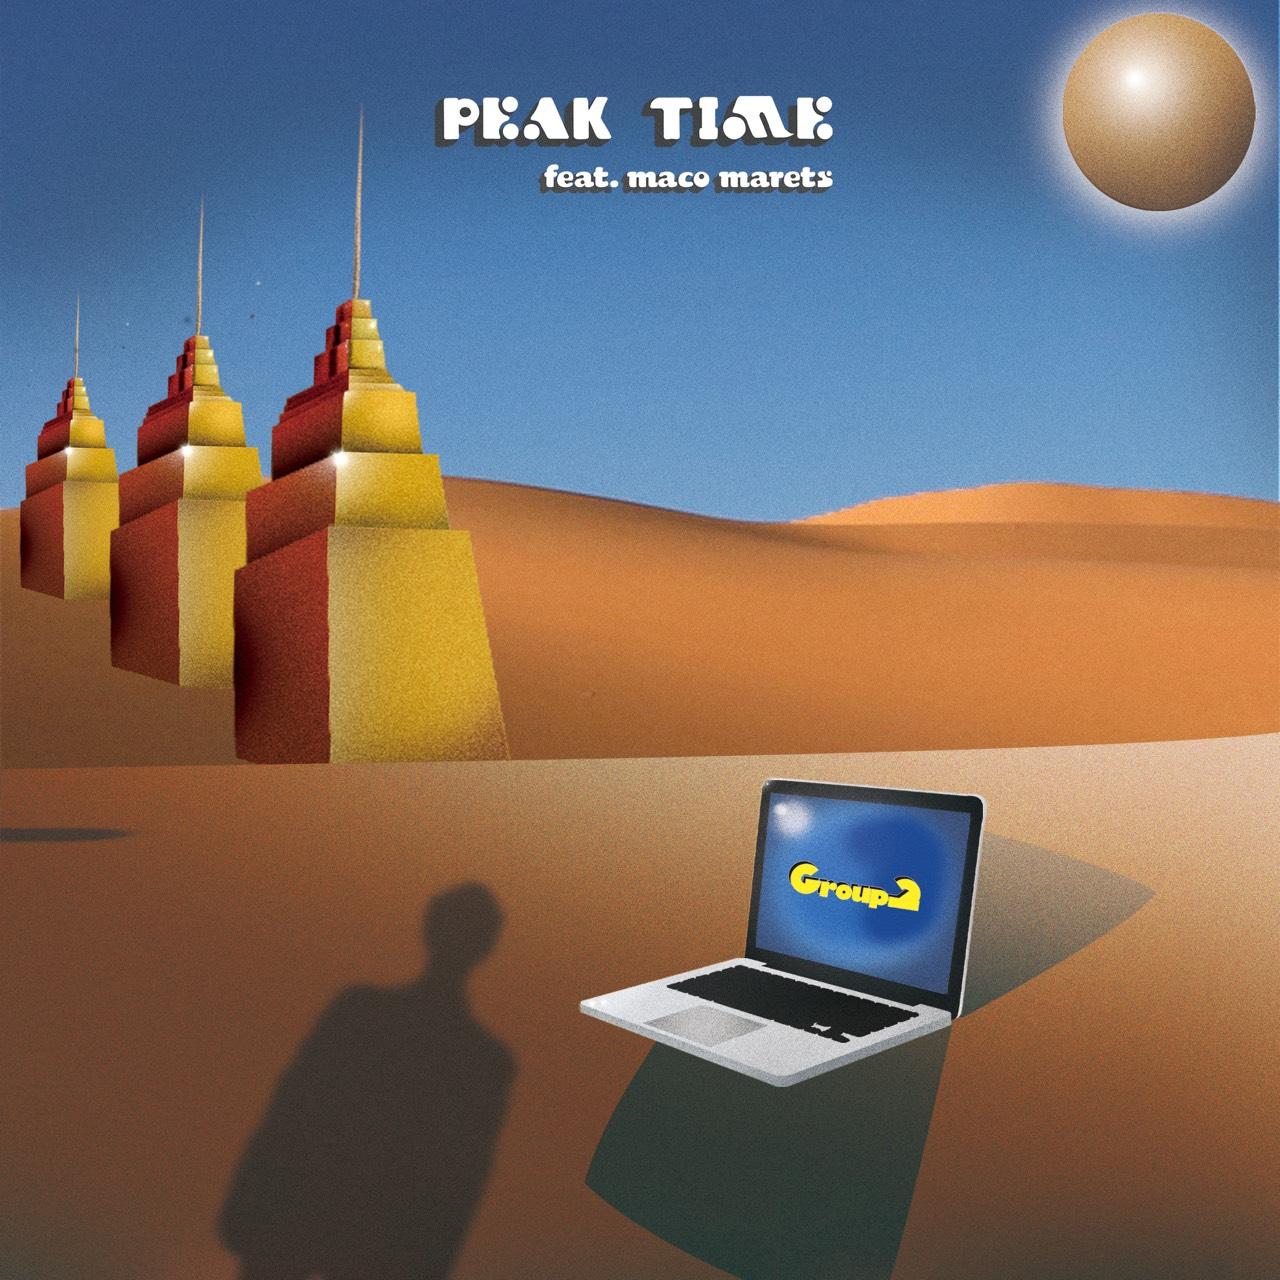 019_PEAK TIME feat. maco marets / セレモニー(Disco edit)